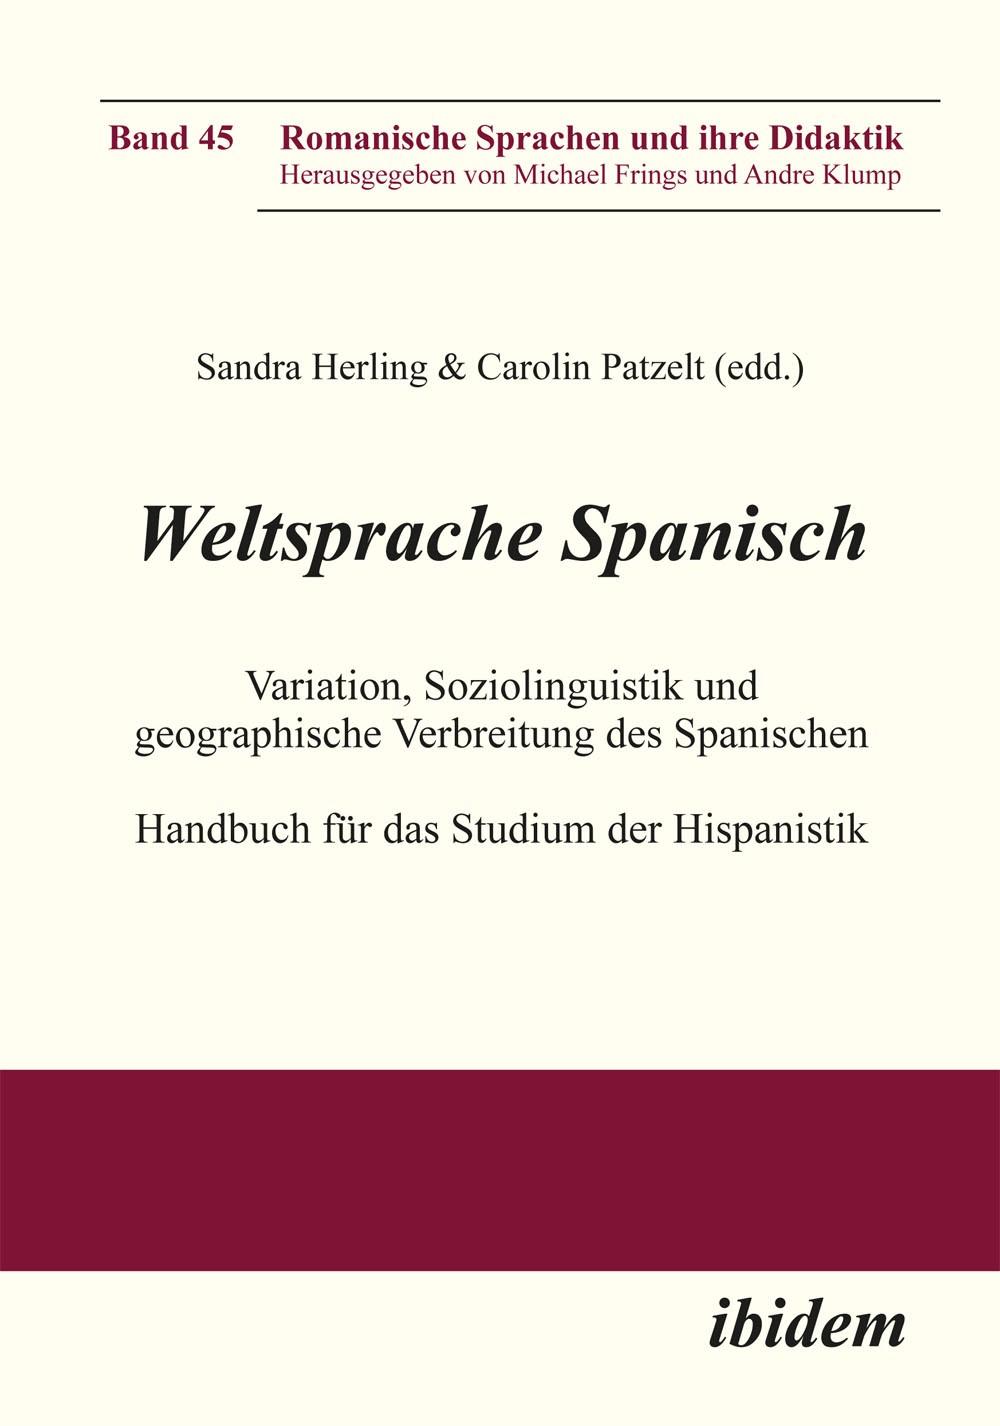 Weltsprache Spanisch